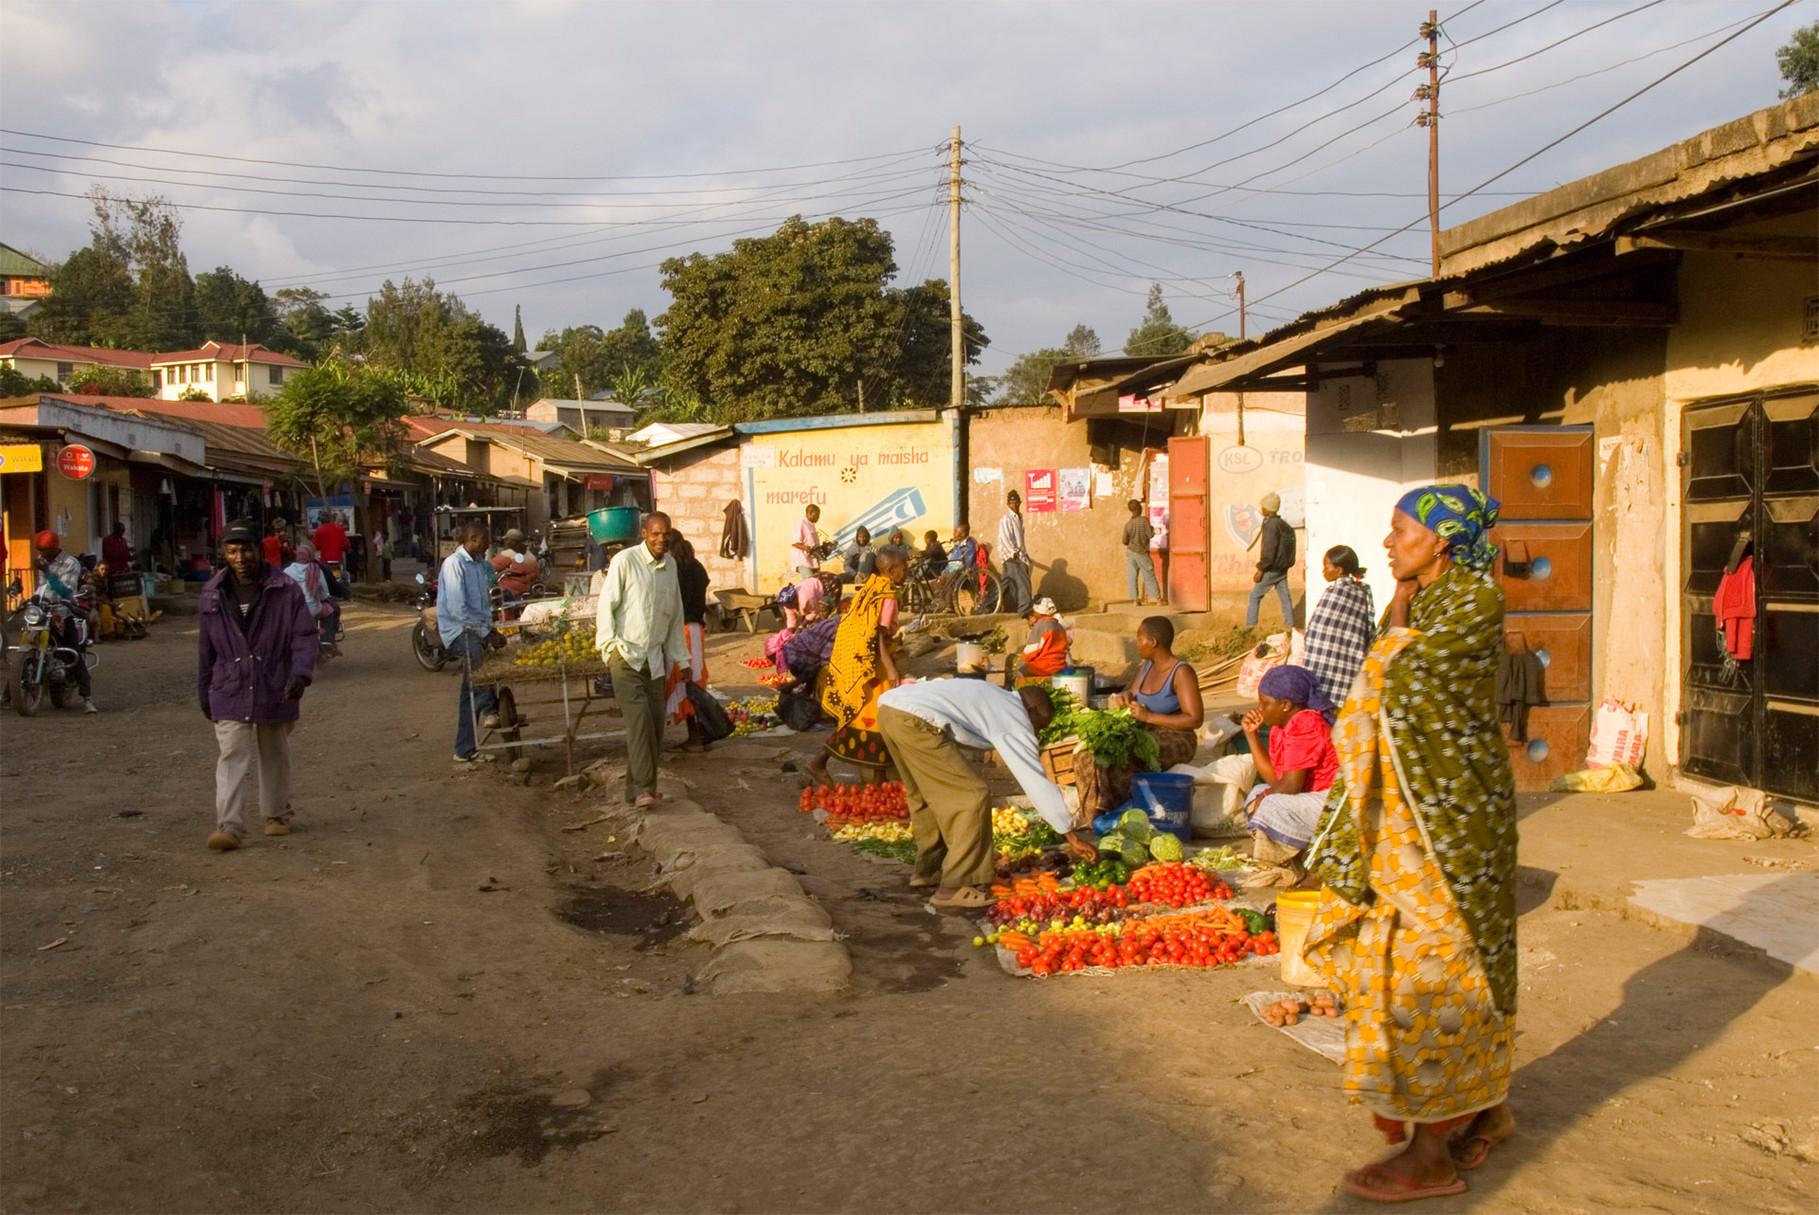 Market in Arusha, 2012